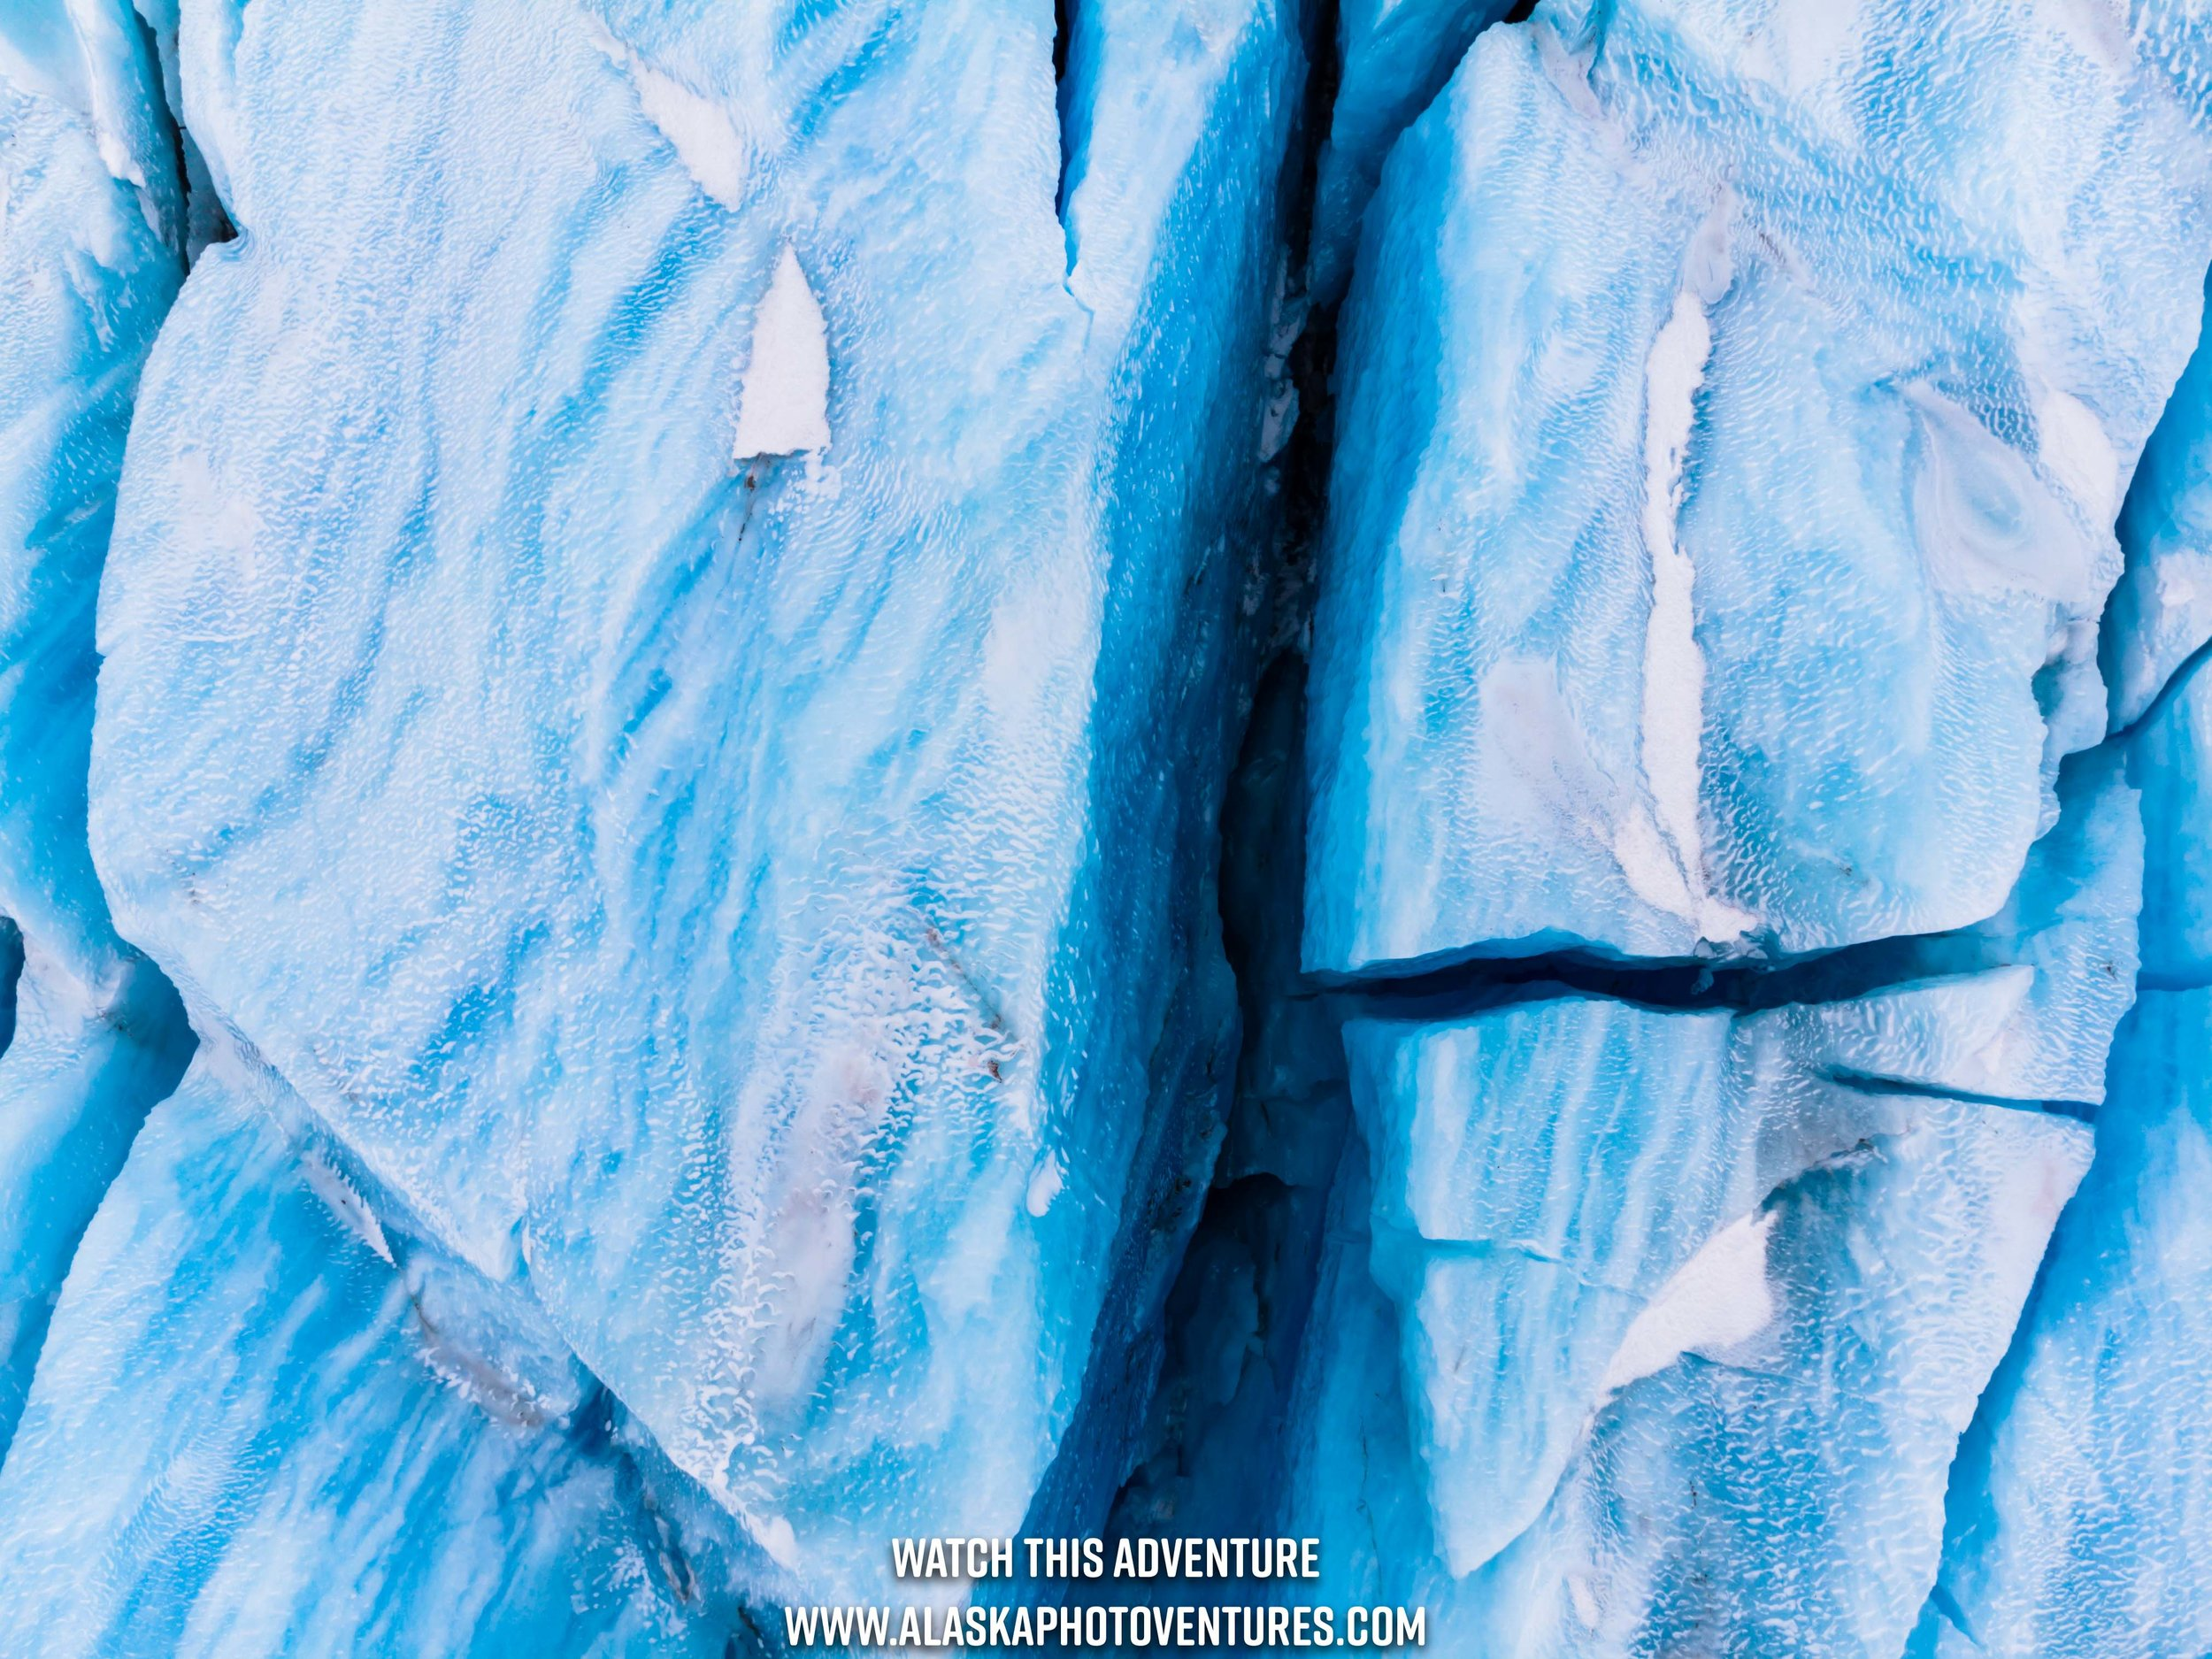 colony-glacier-adventure-photography-tv-show-alaska.jpg